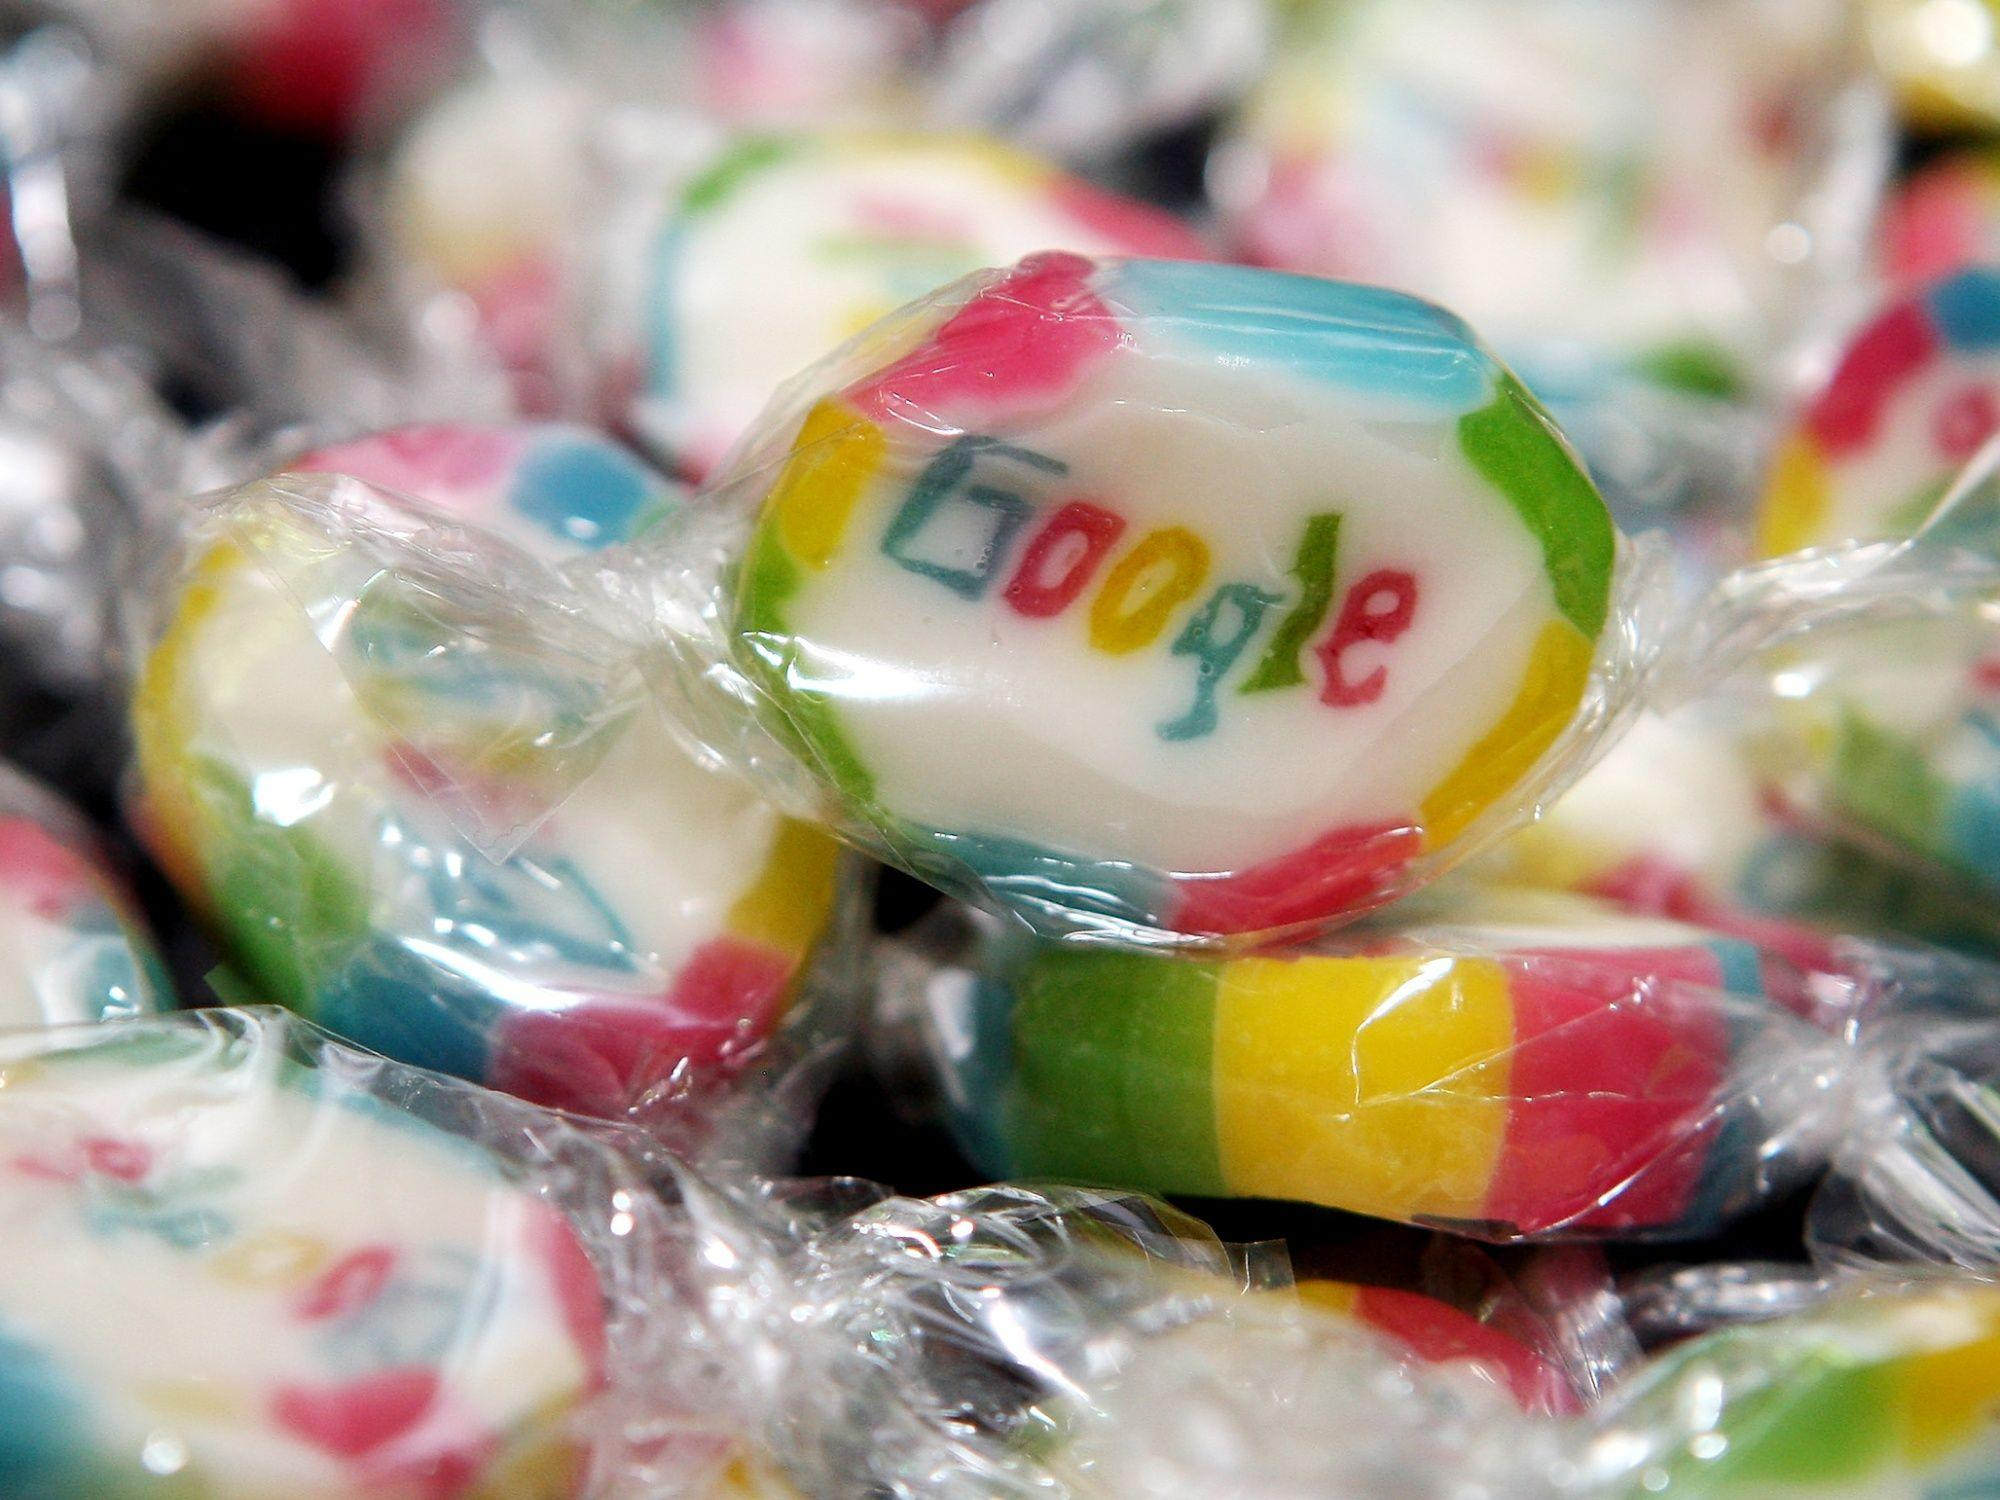 Google's $2.6 Billion Fine Is Like Loose Change, Judge Says